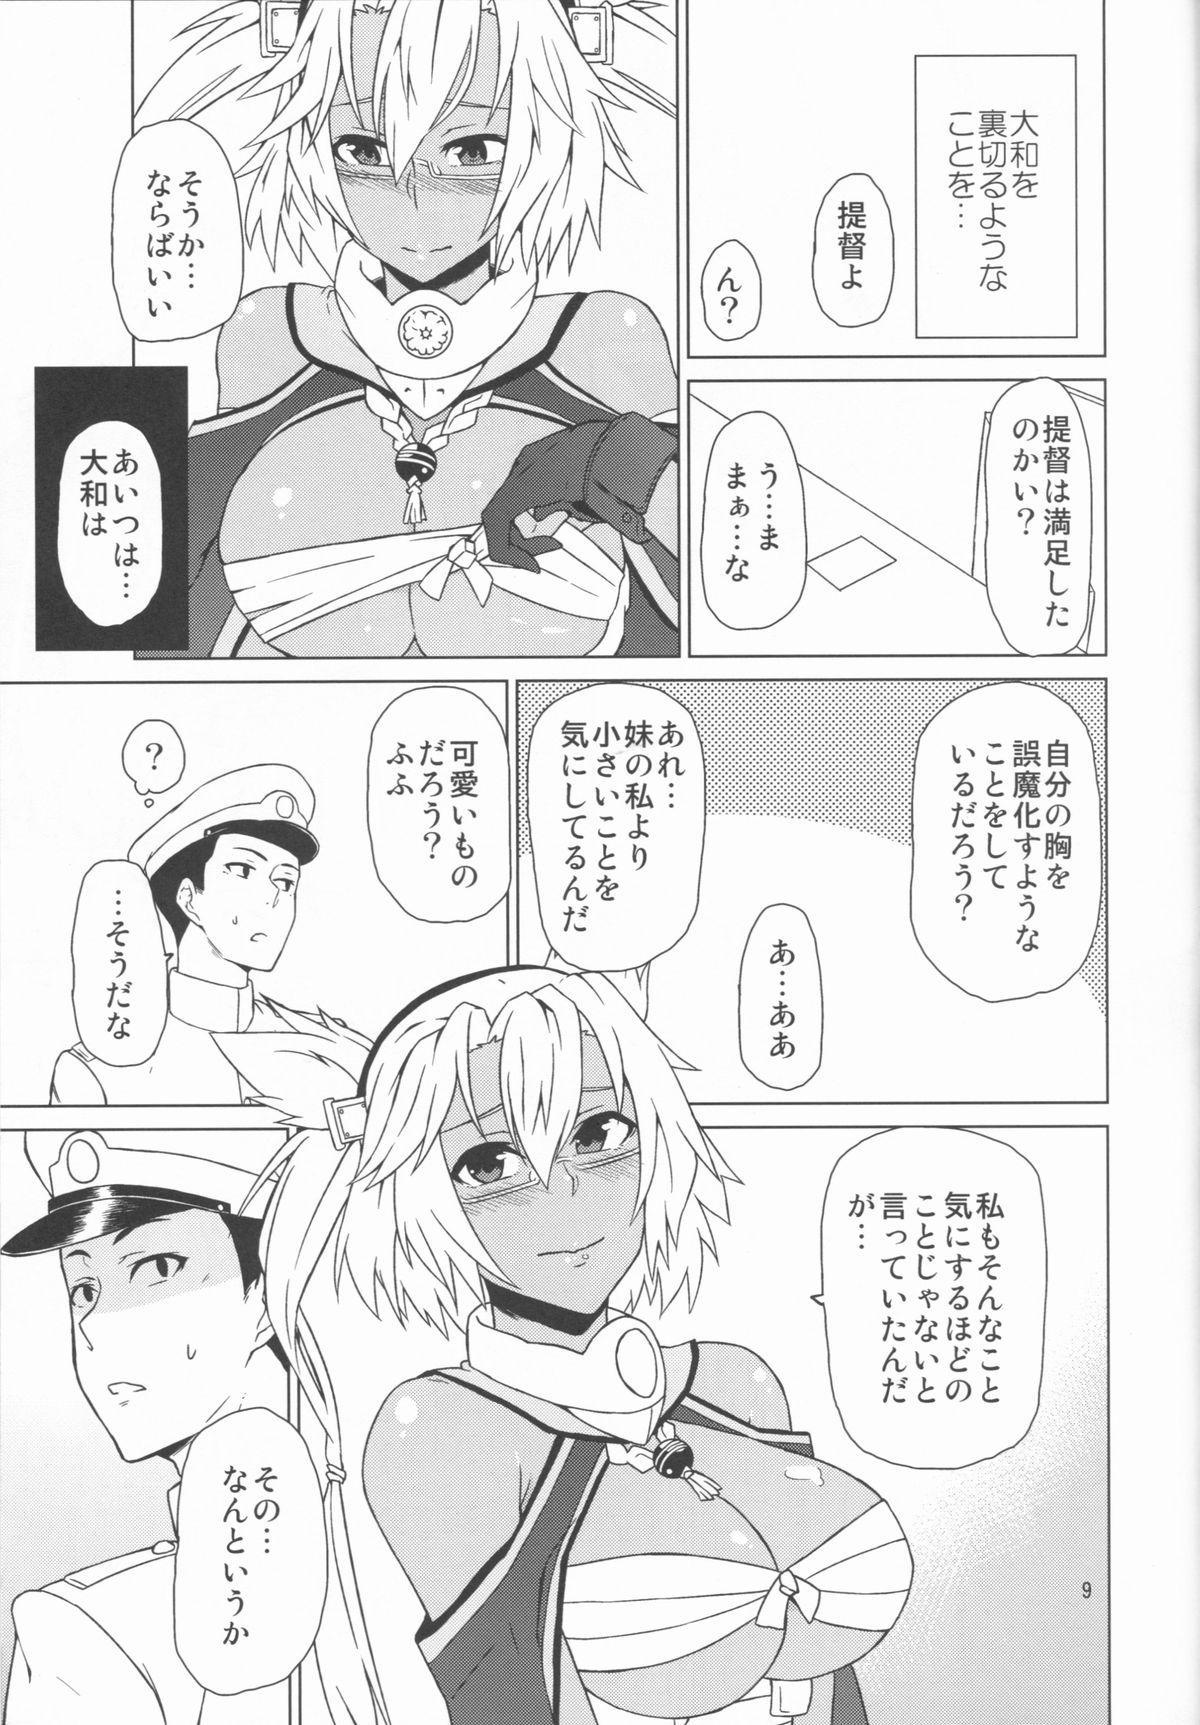 Musashi Route 10